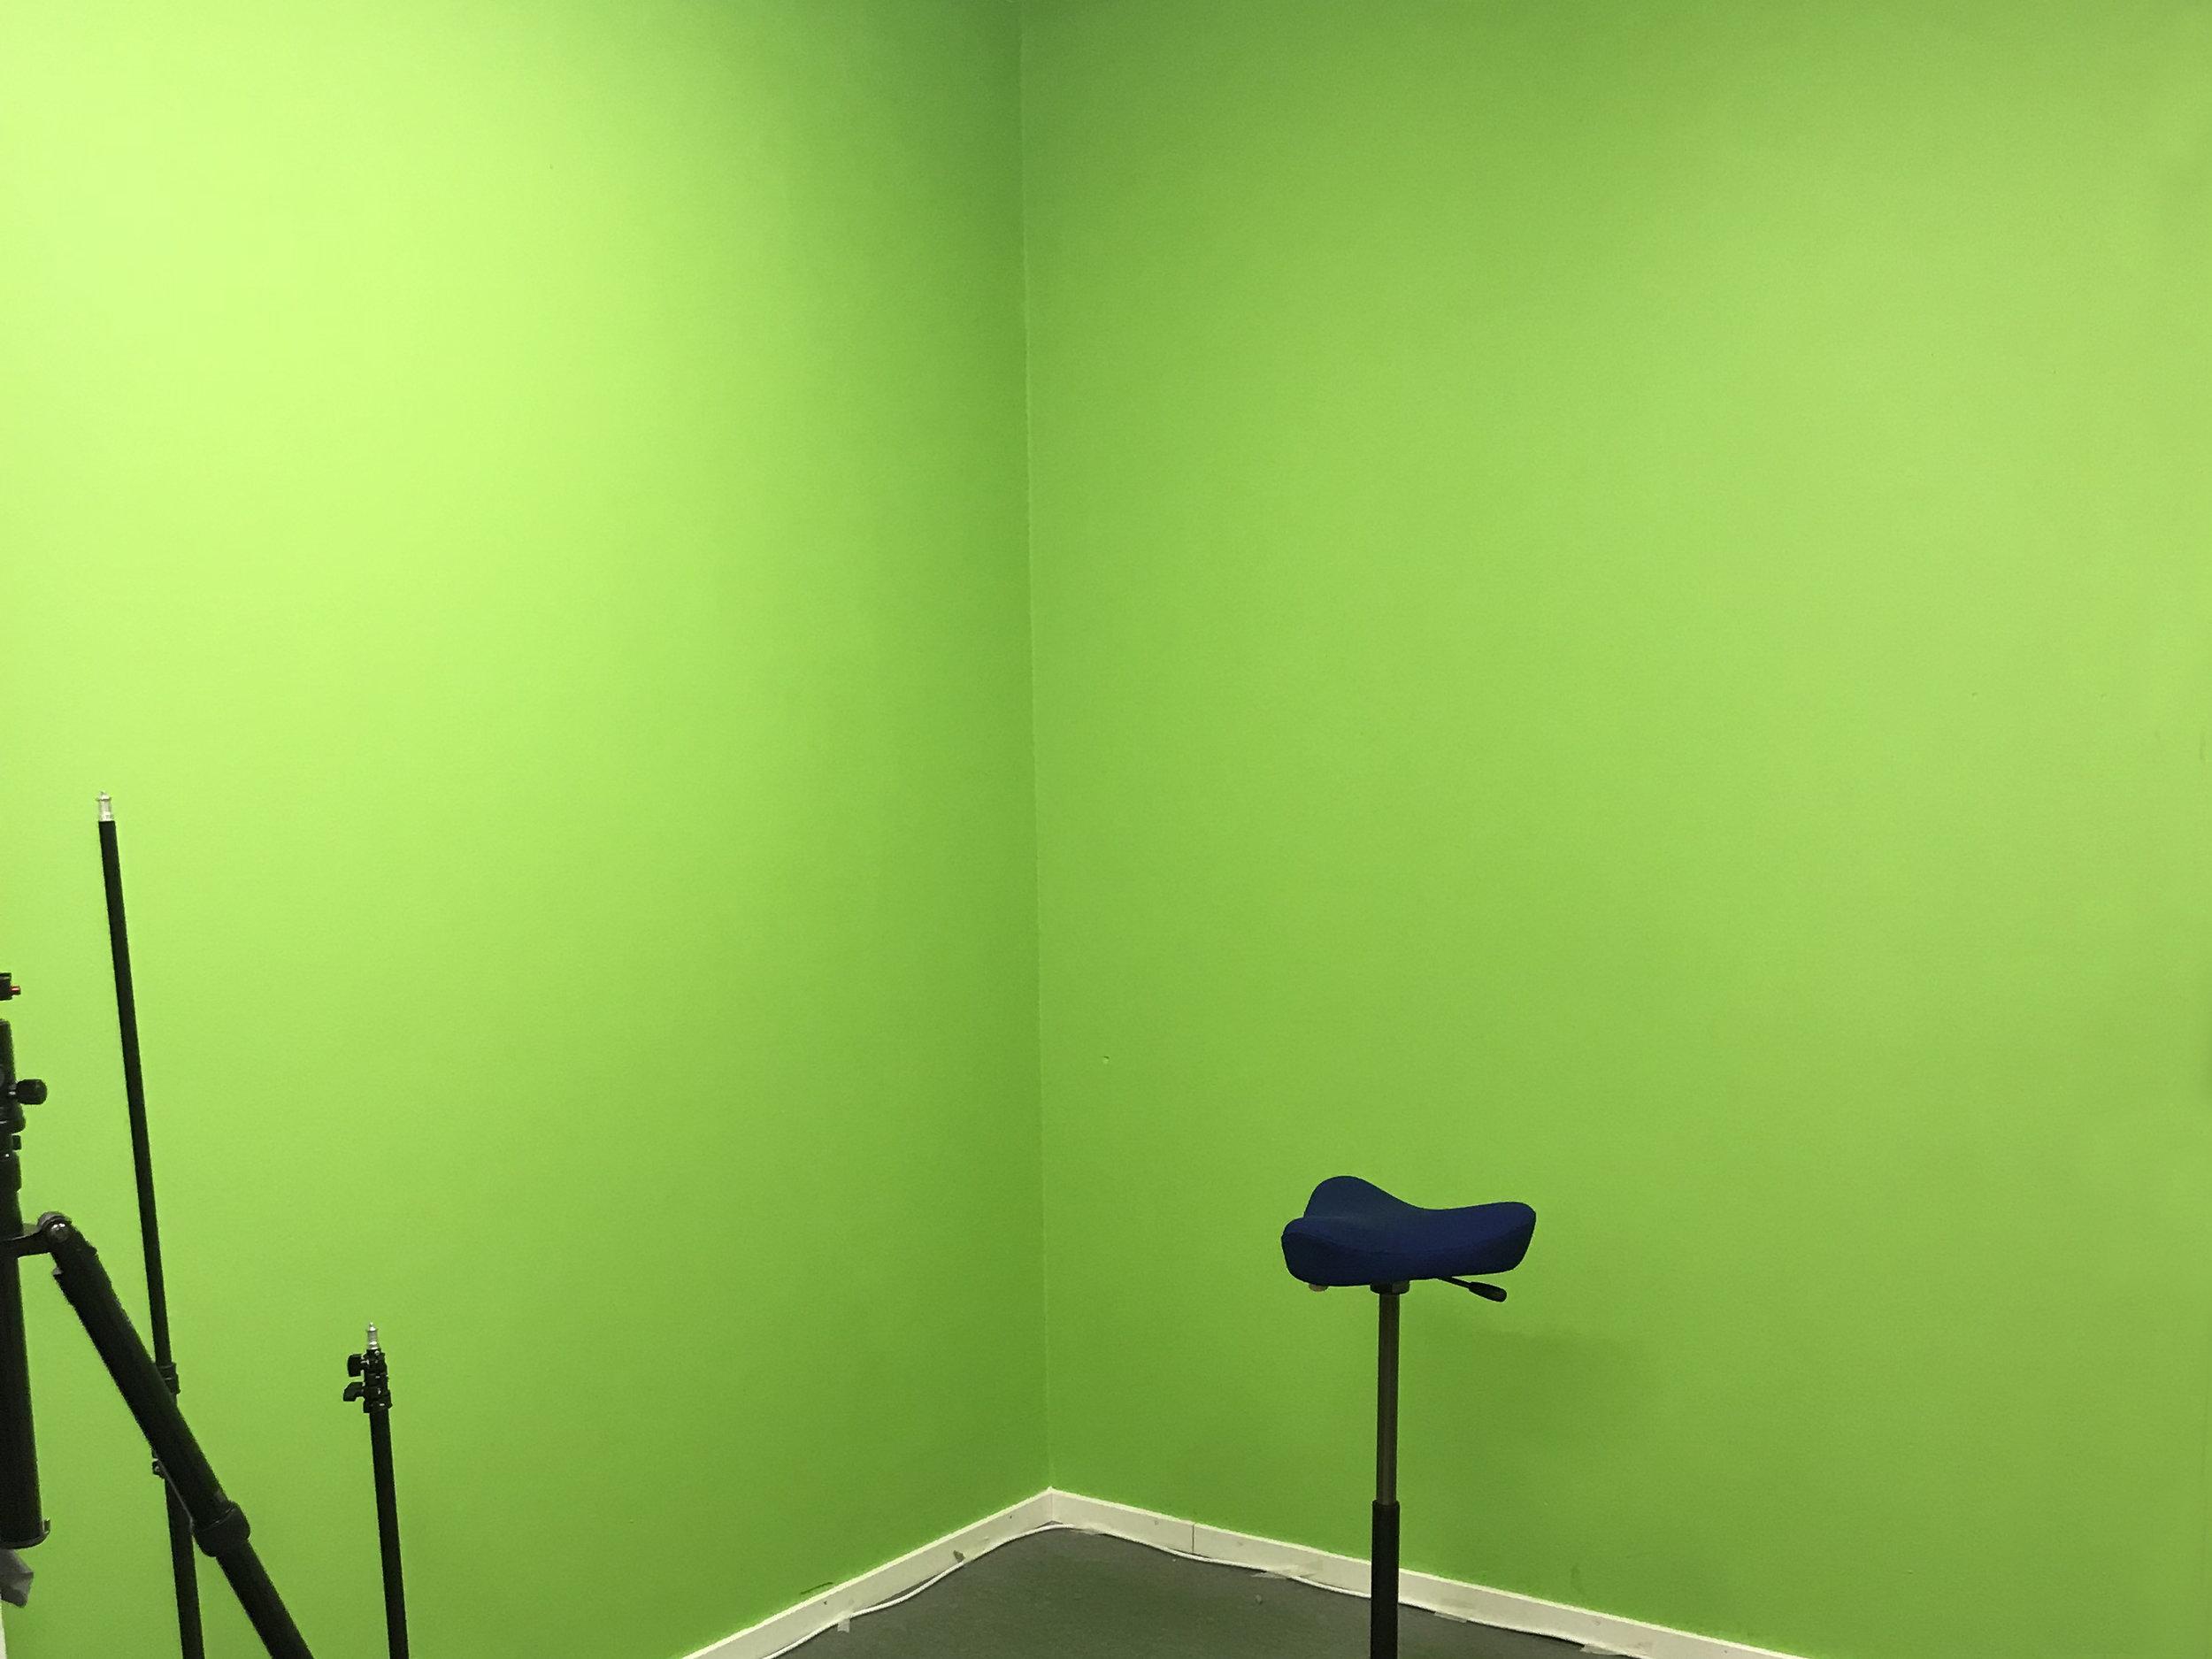 Green Screen Room 1